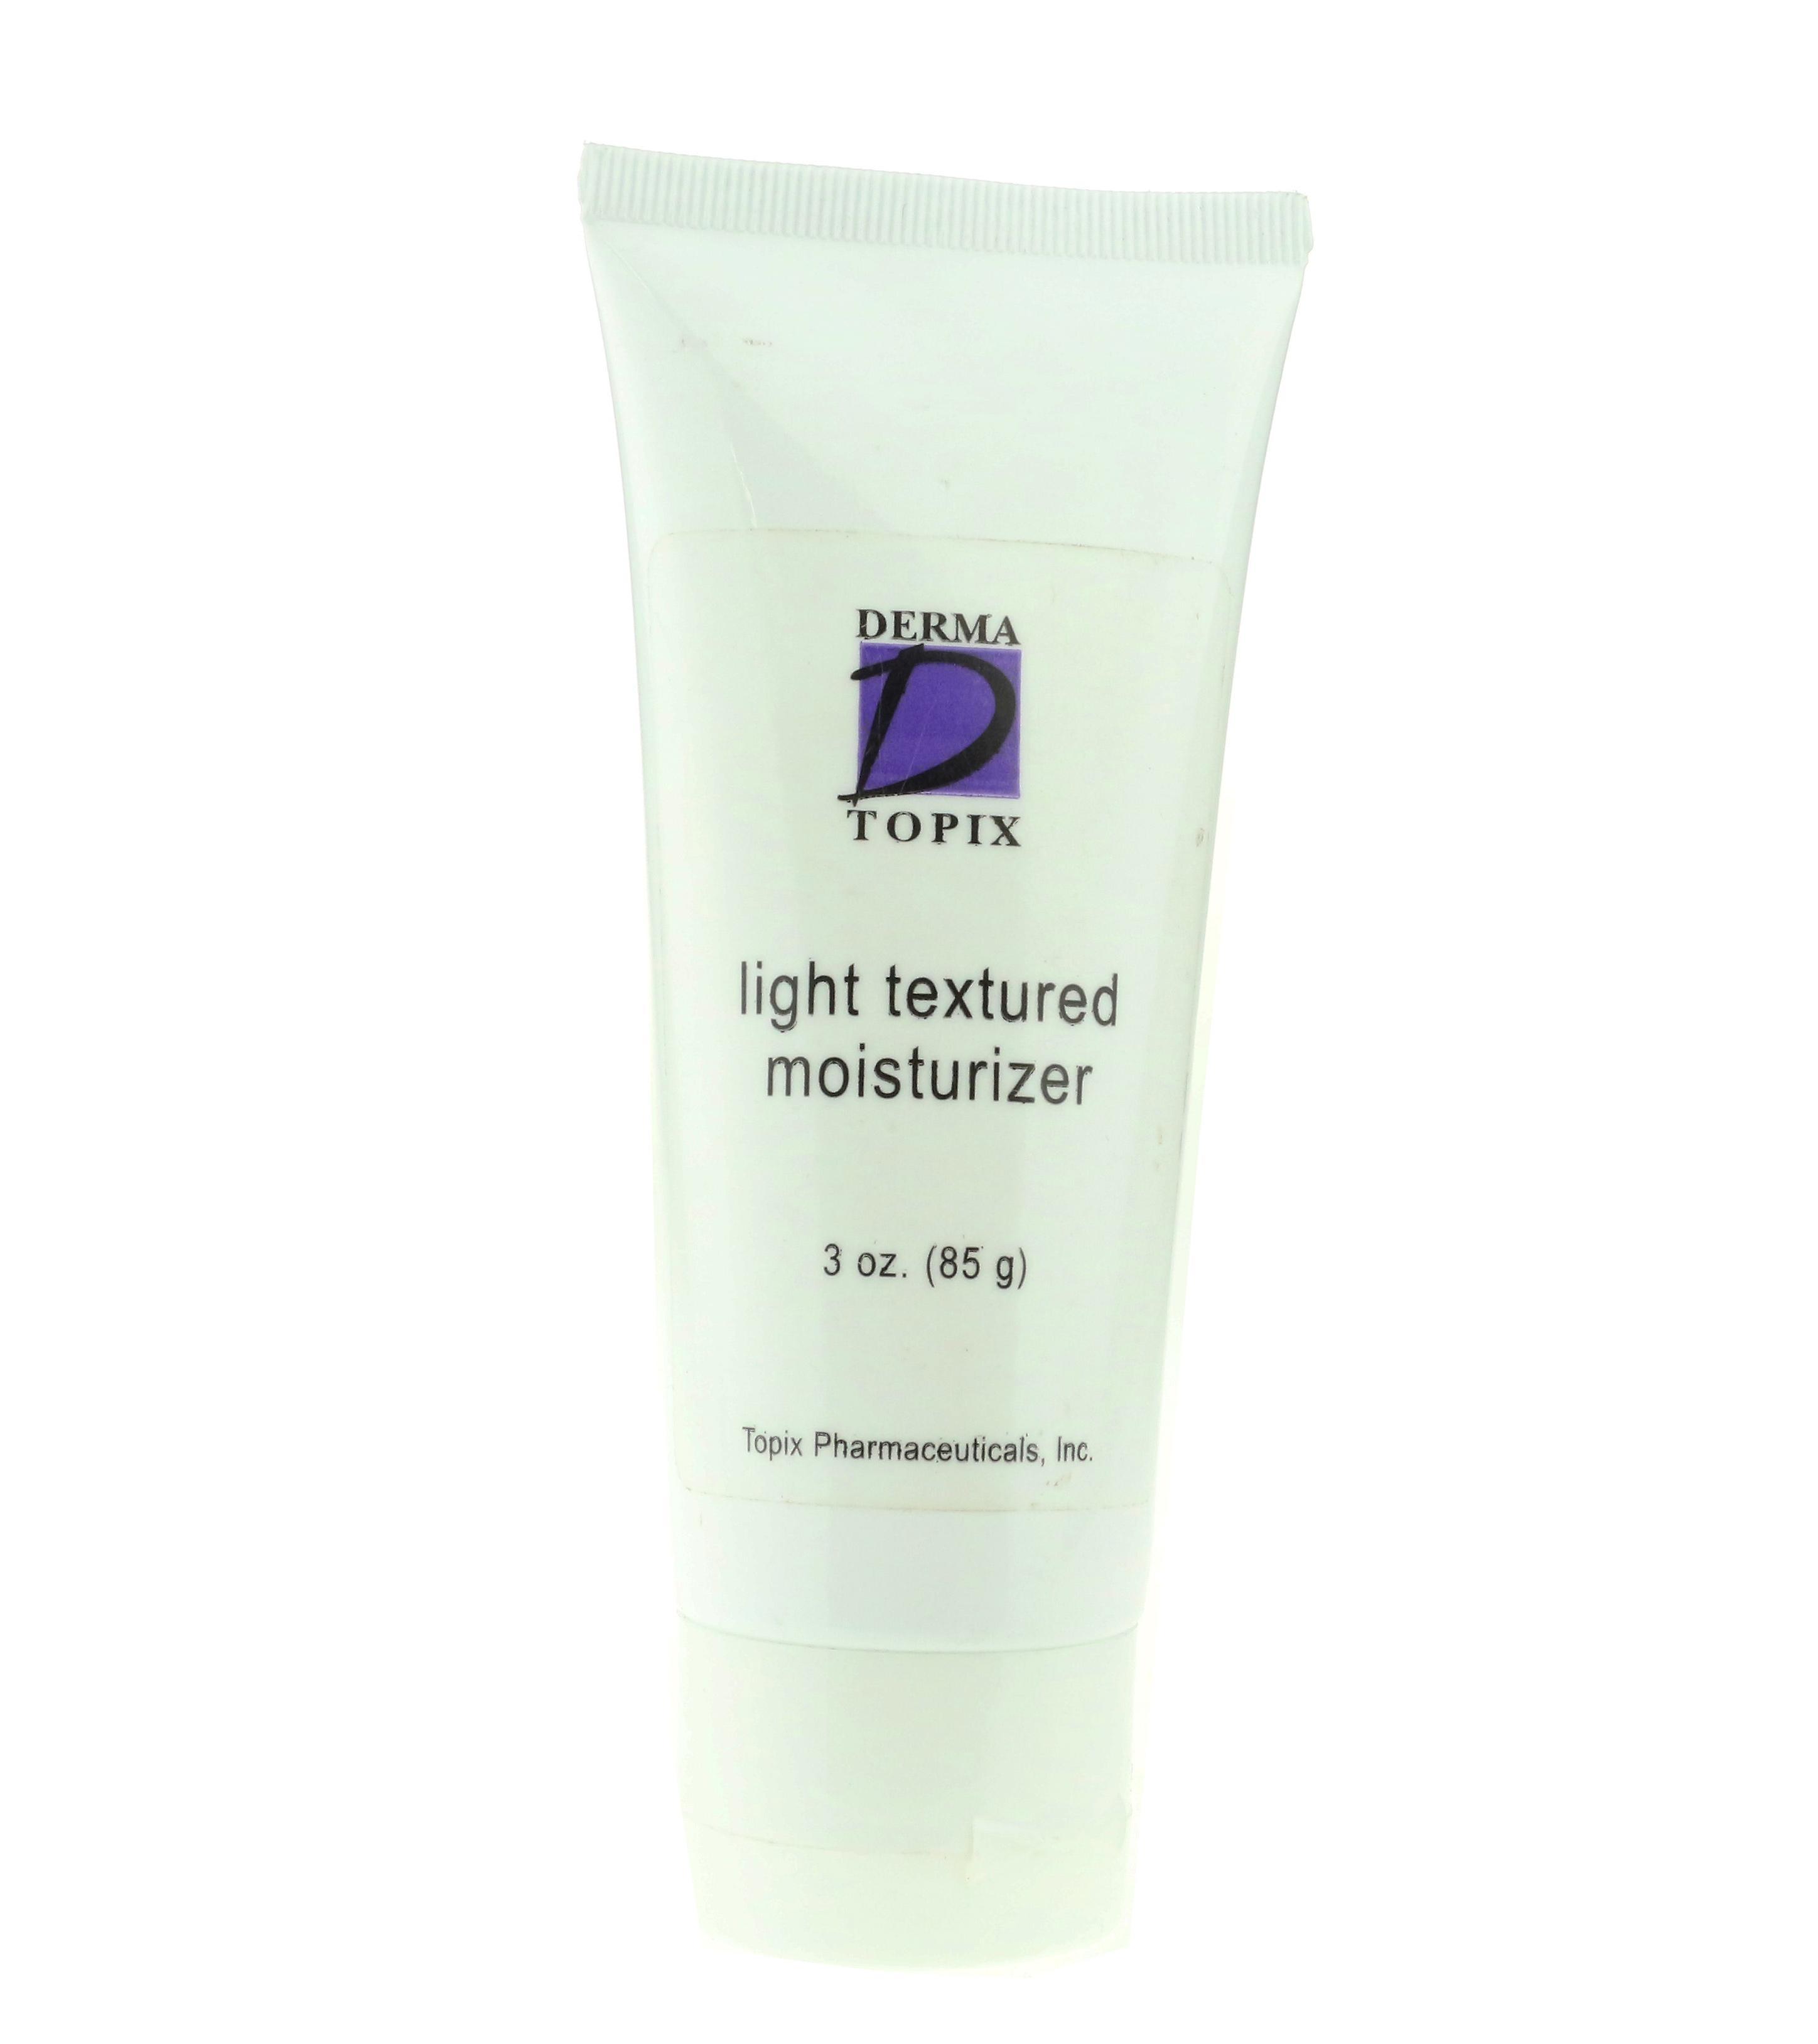 Moisturizer Derma 3oz Textured Unboxed Light 85g New Topix 3ALq4R5j